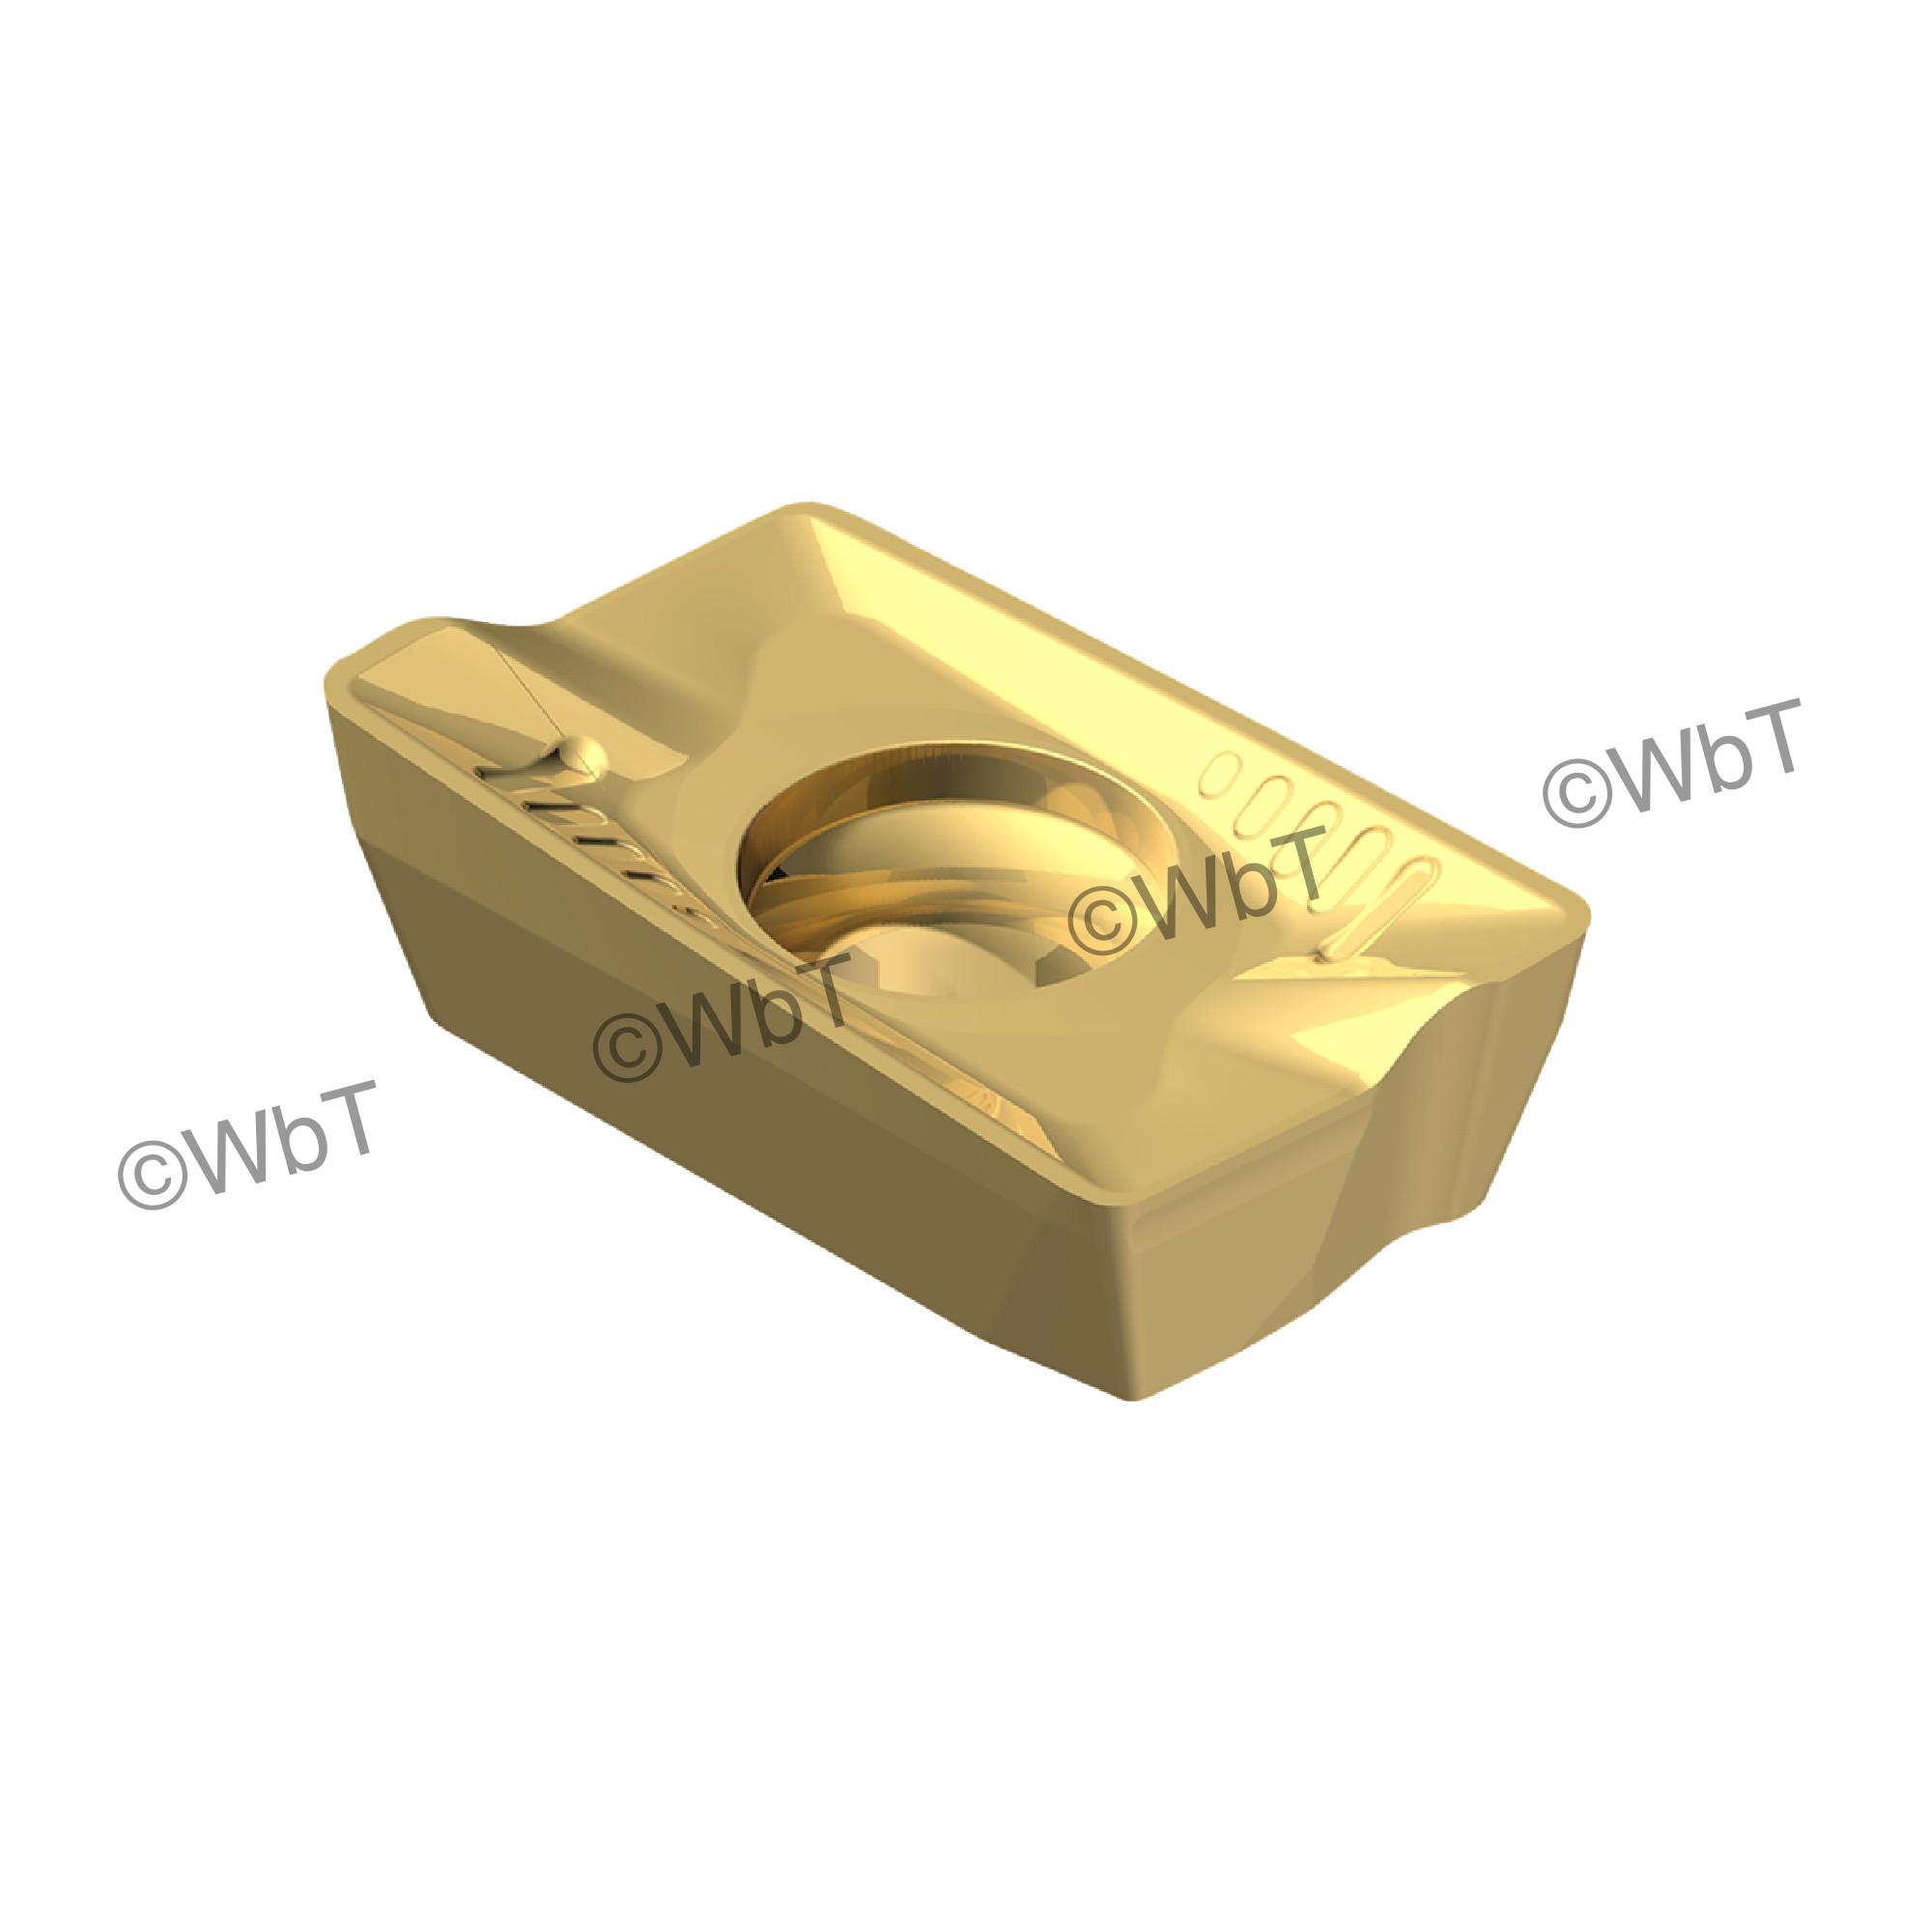 AKUMA - APKT1604PDR-R1 CM30P Parallelogram / Indexable Carbide Milling Insert